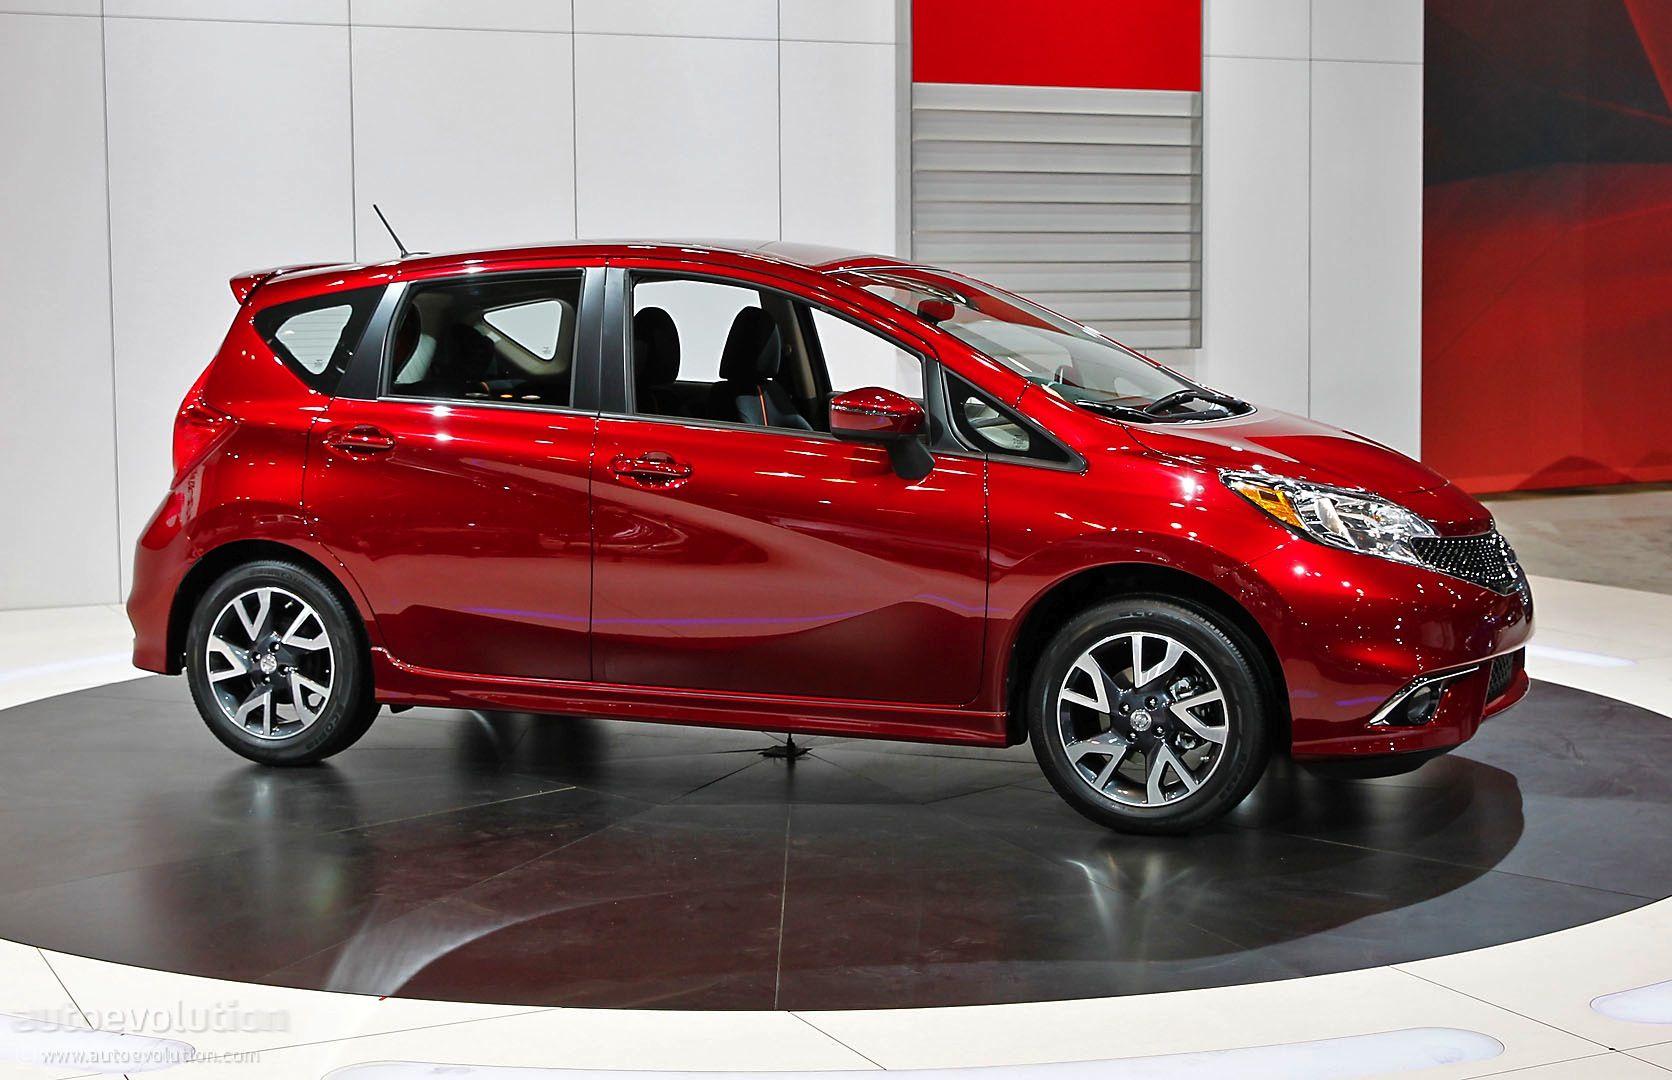 2015 Nissan Versa Note Sr Turismo Coches Motores